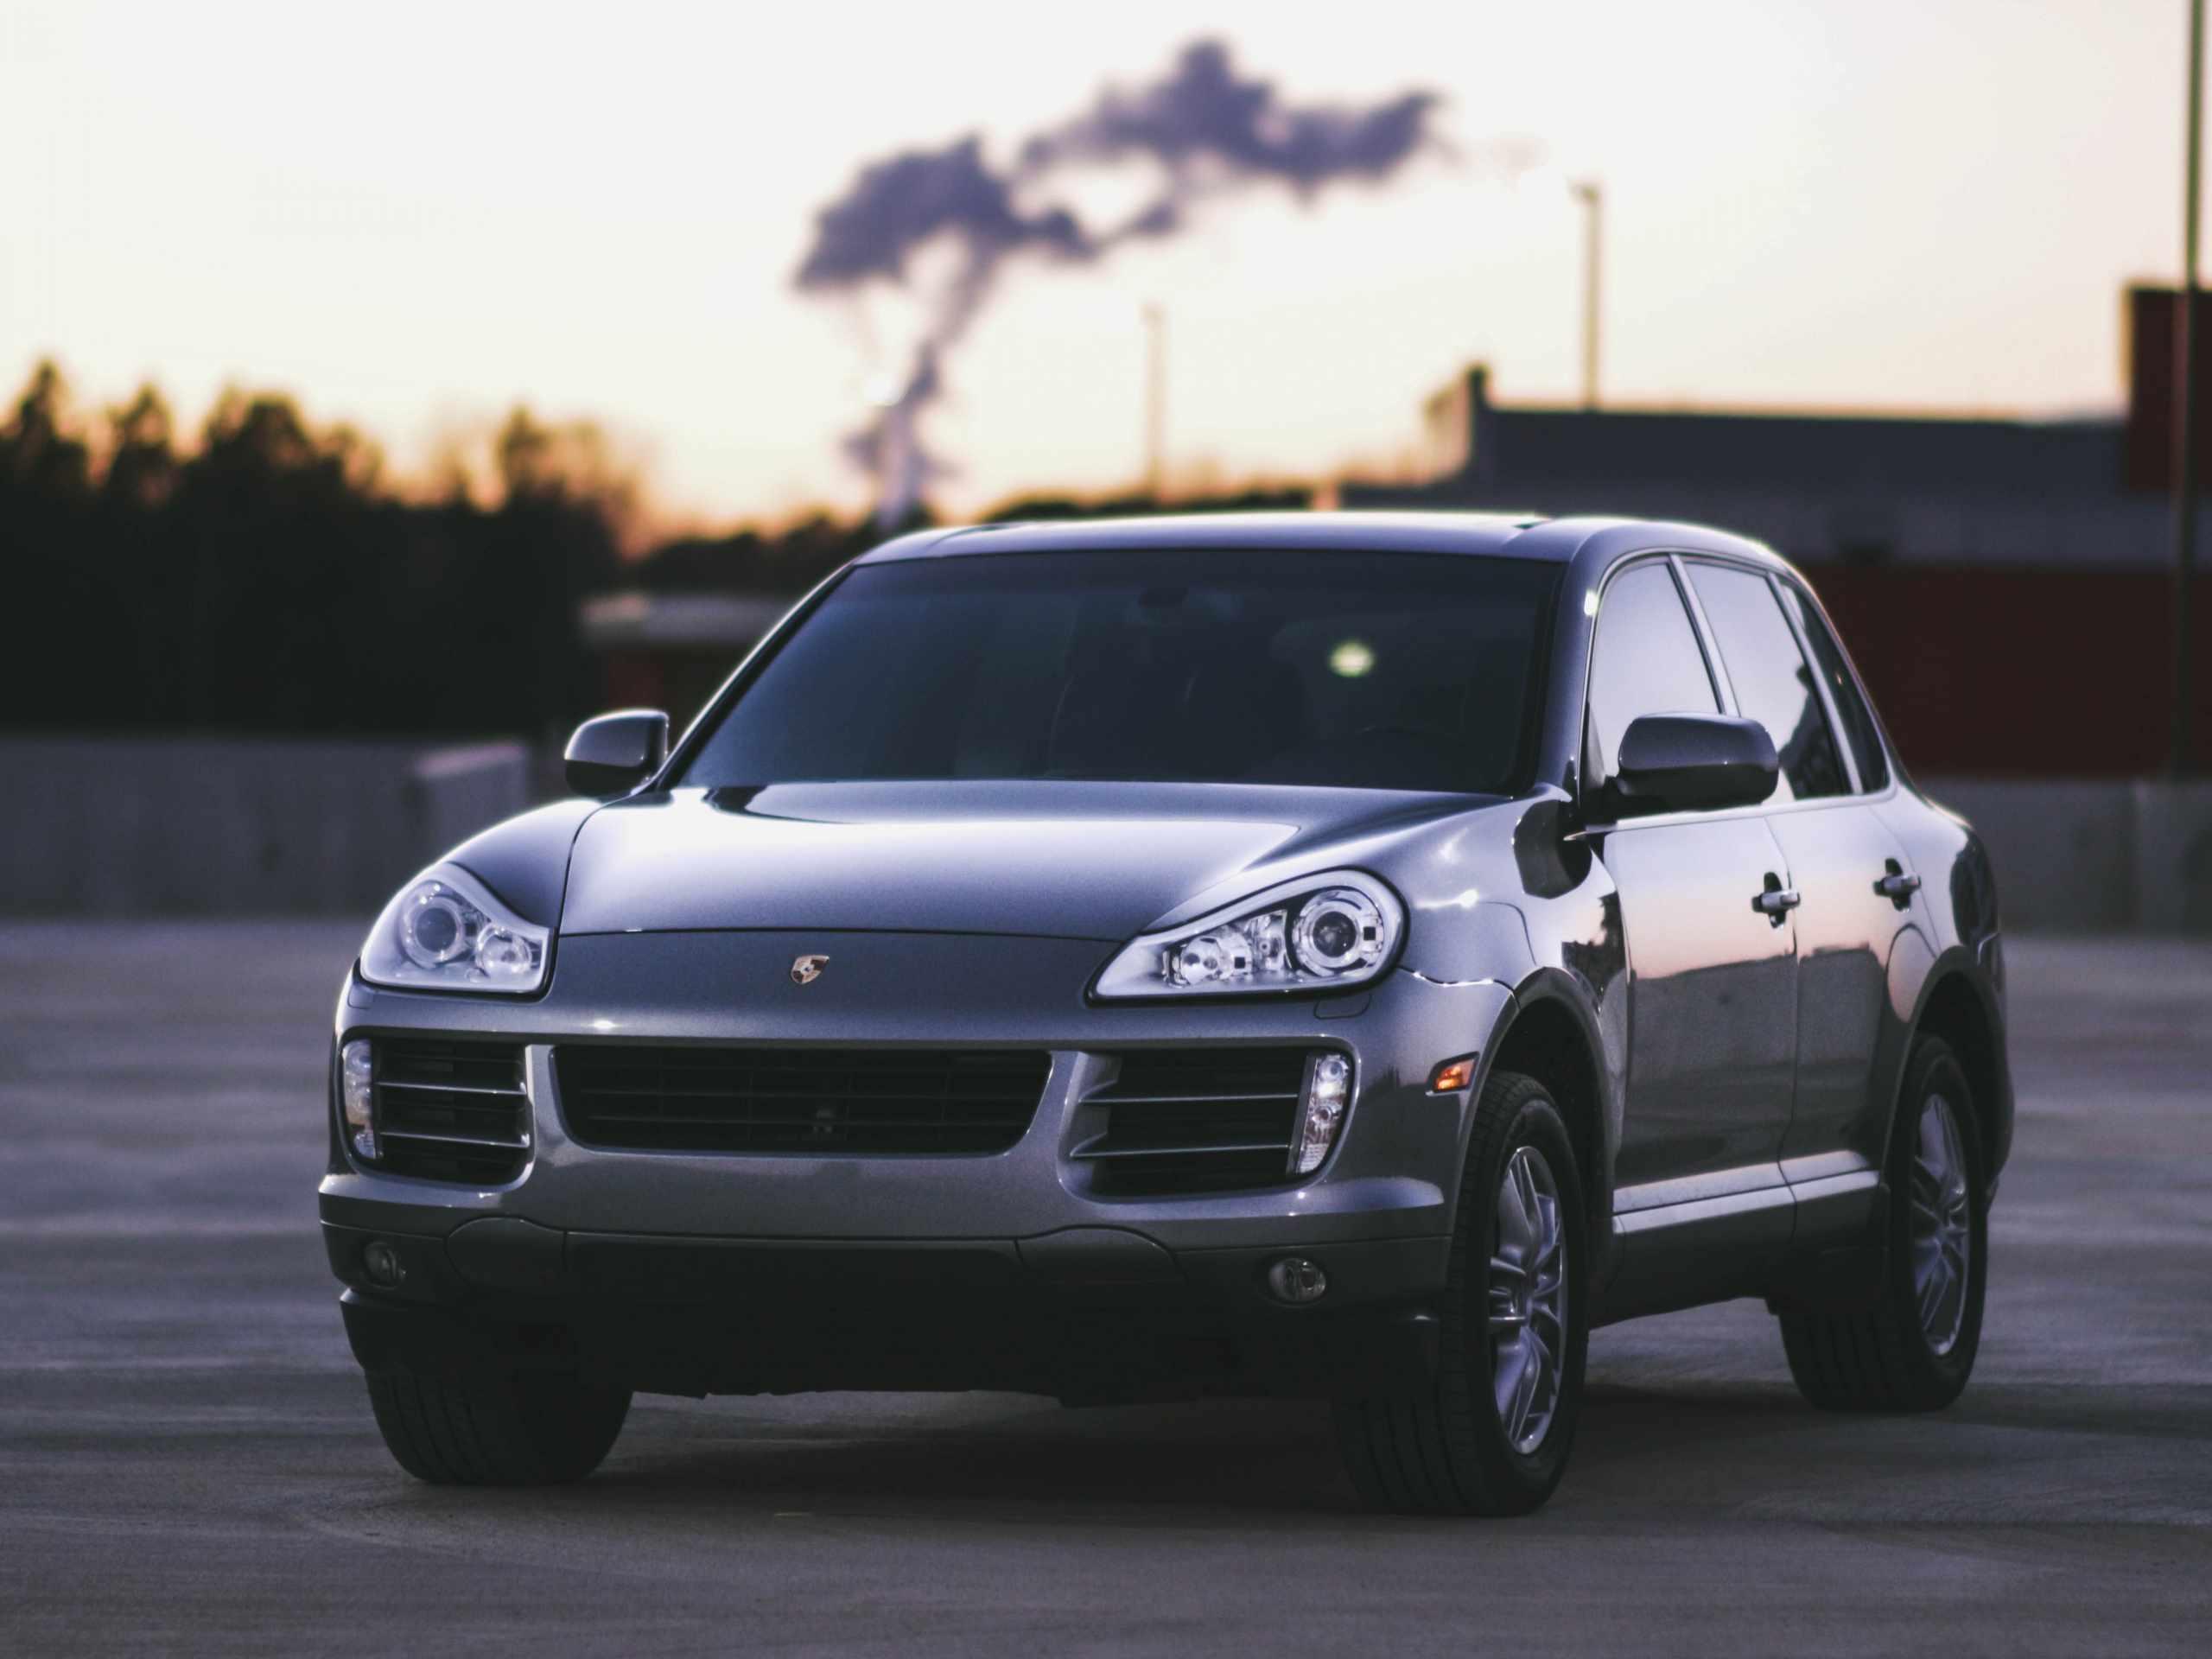 Latest Car Tech Trends